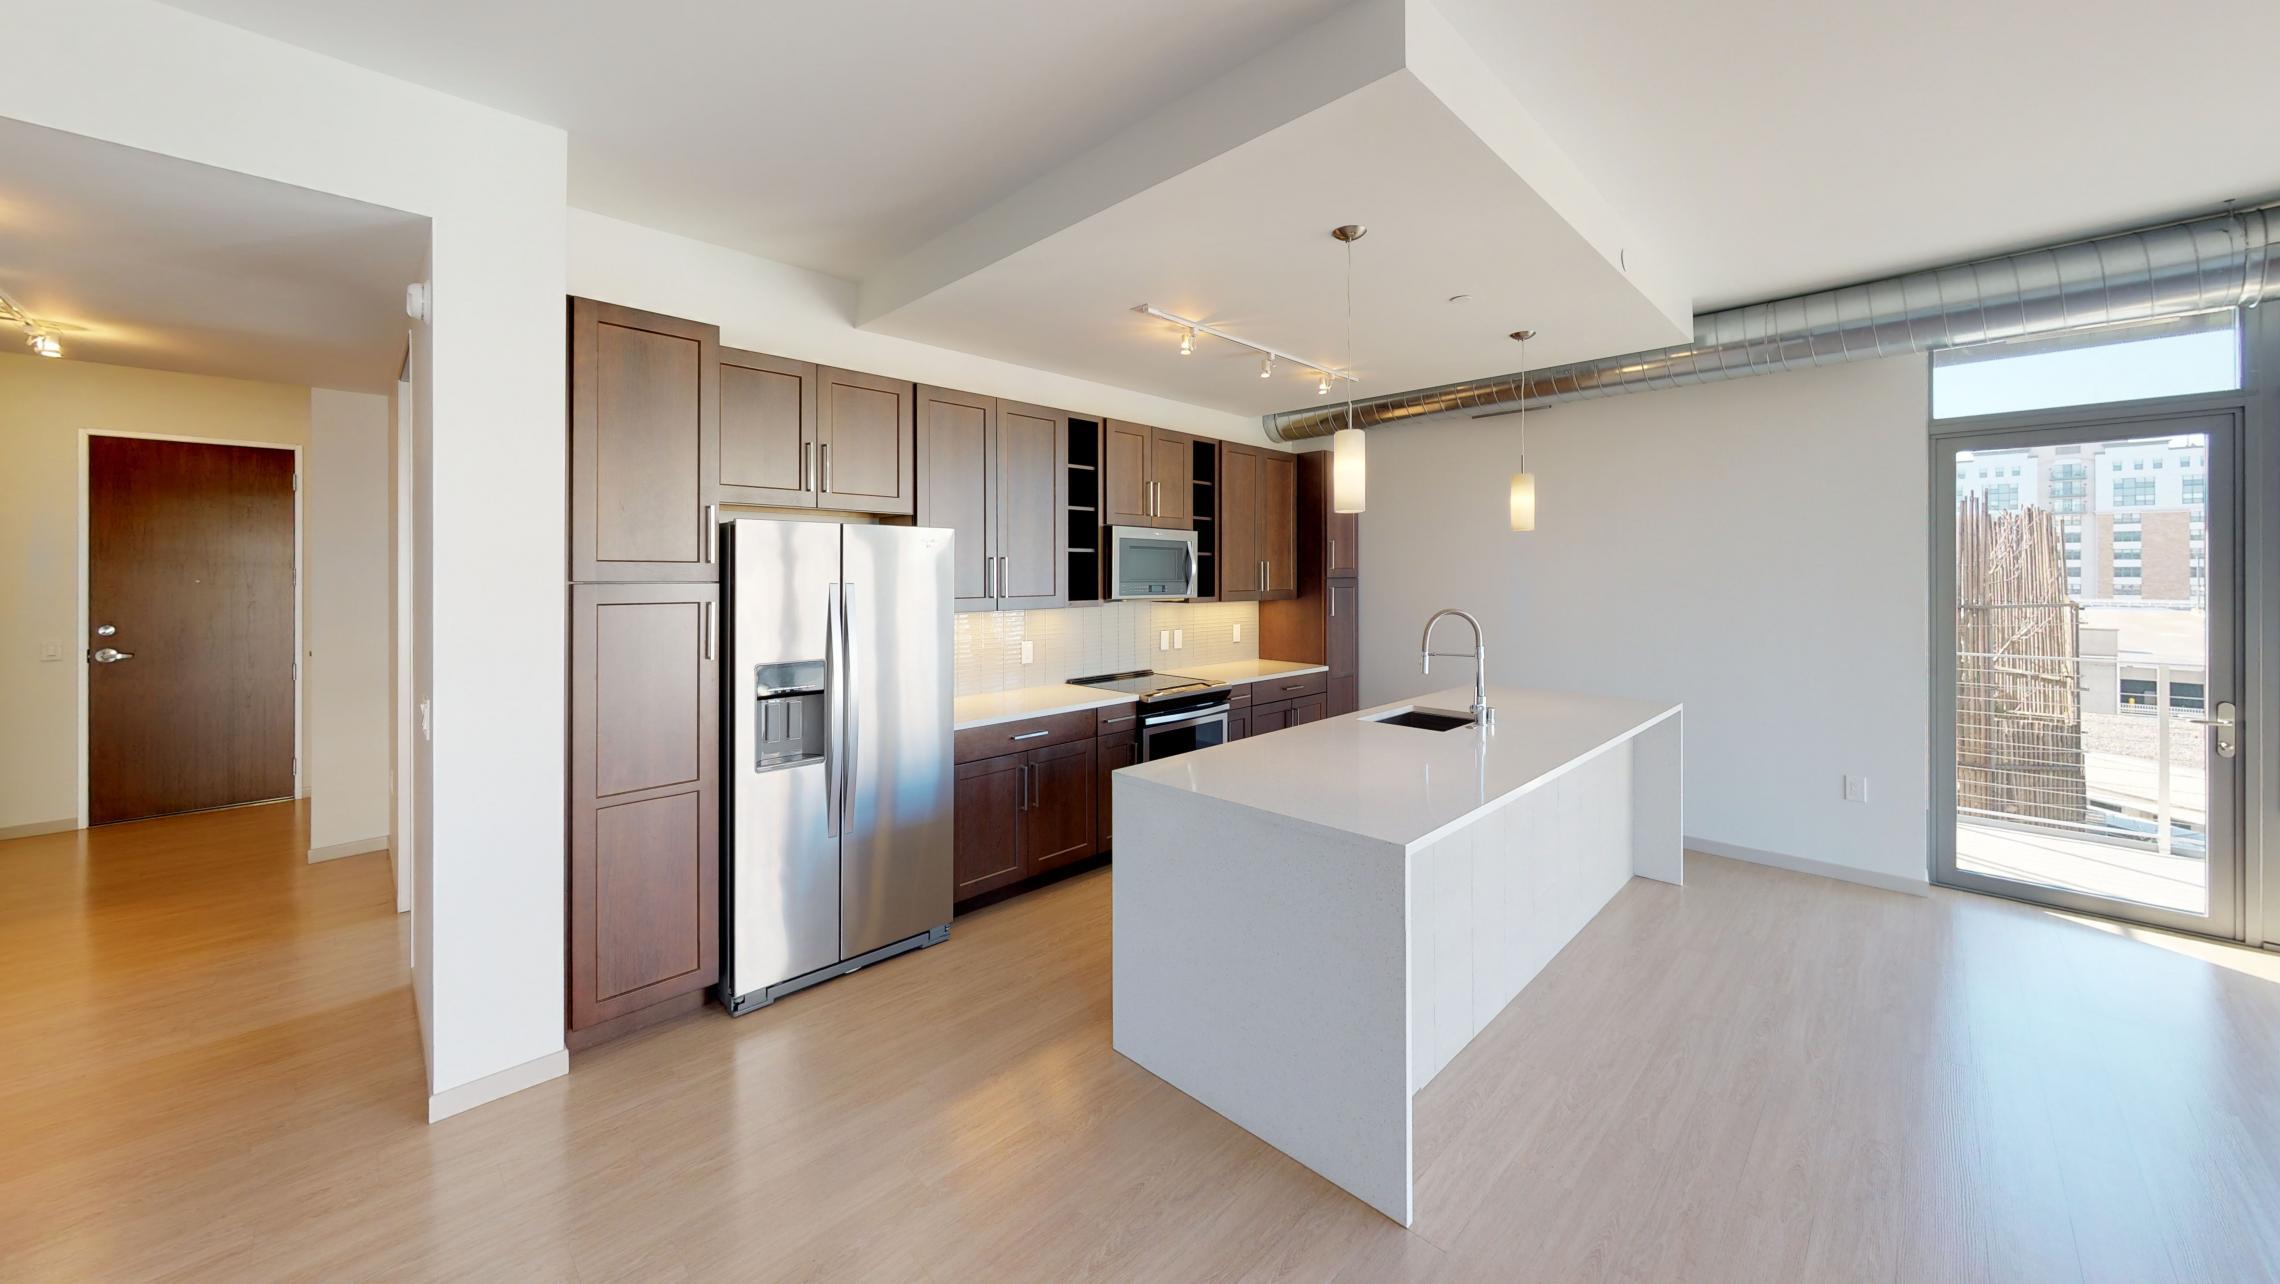 Pressman-Kitchen-Apartment-512-Two-Bedroom-Downtown-Upscale-Luxury-Capitol-View-Balcony-Corner-Lake-Madison